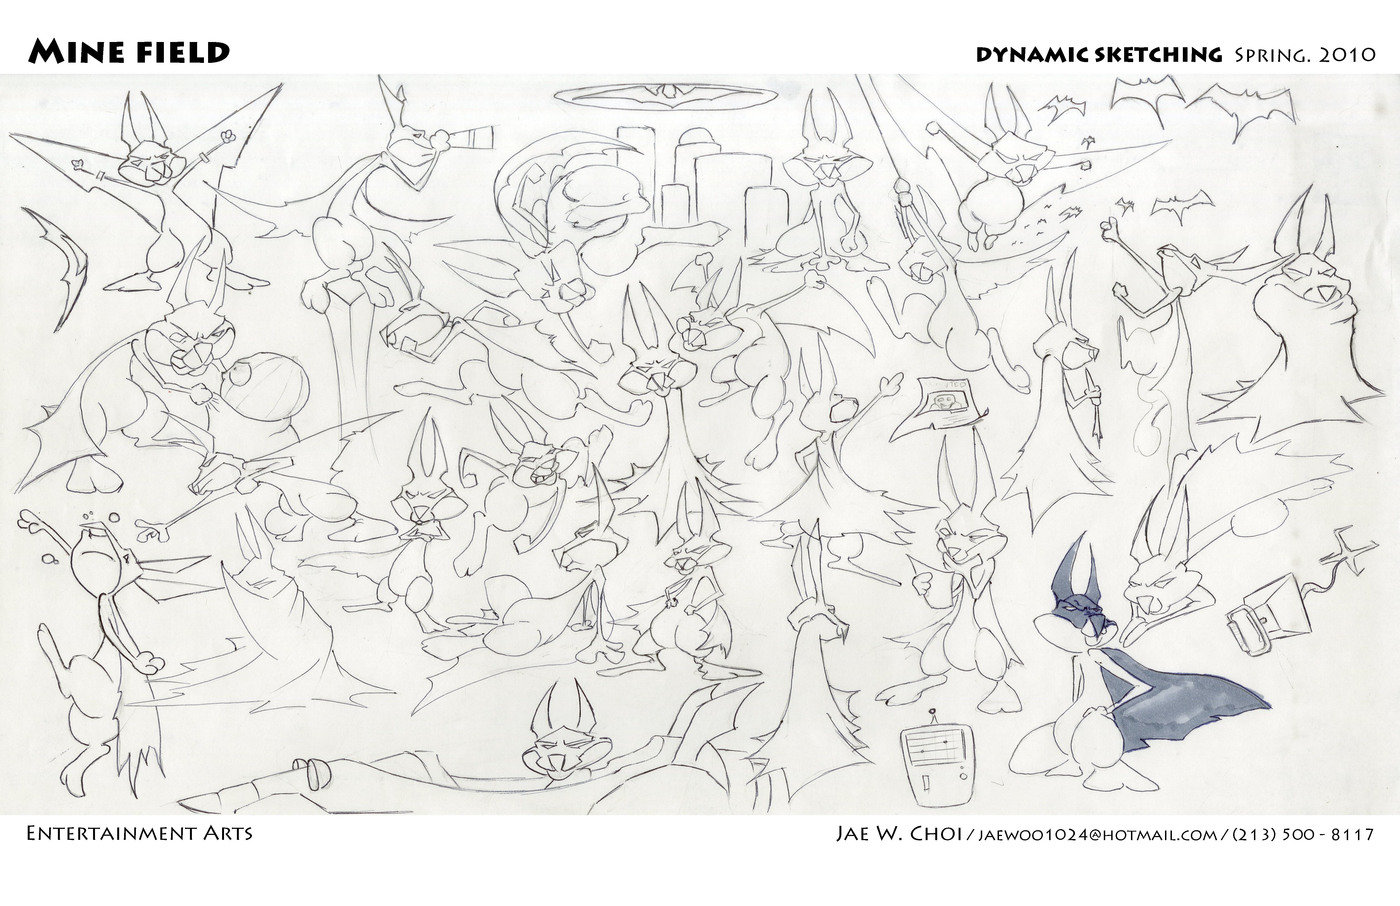 Quick Sketch by Jae Woo Choi at Coroflot.com